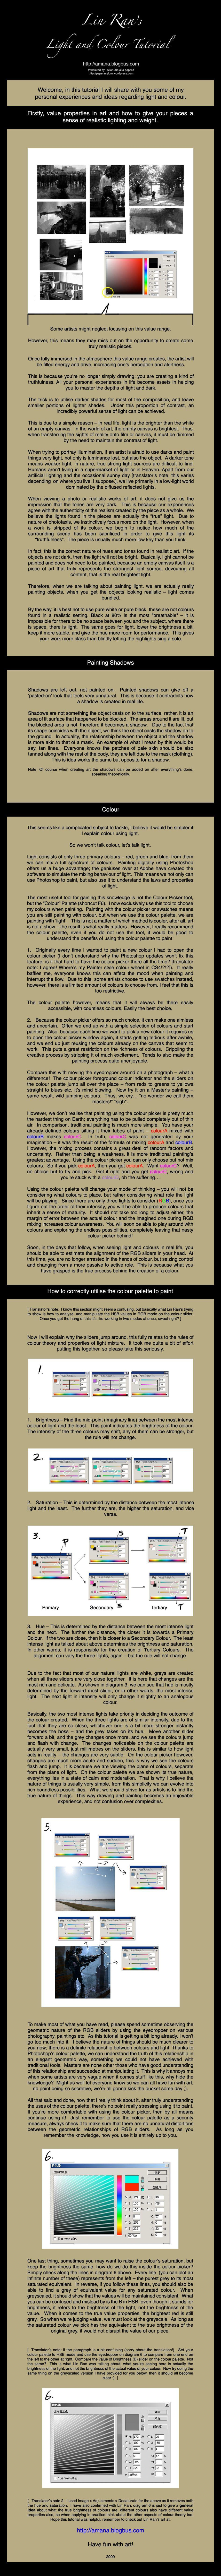 Translationlinrans light and colour tutorial mini tut big translationlinrans light and colour tutorial mini tut big download baditri Choice Image